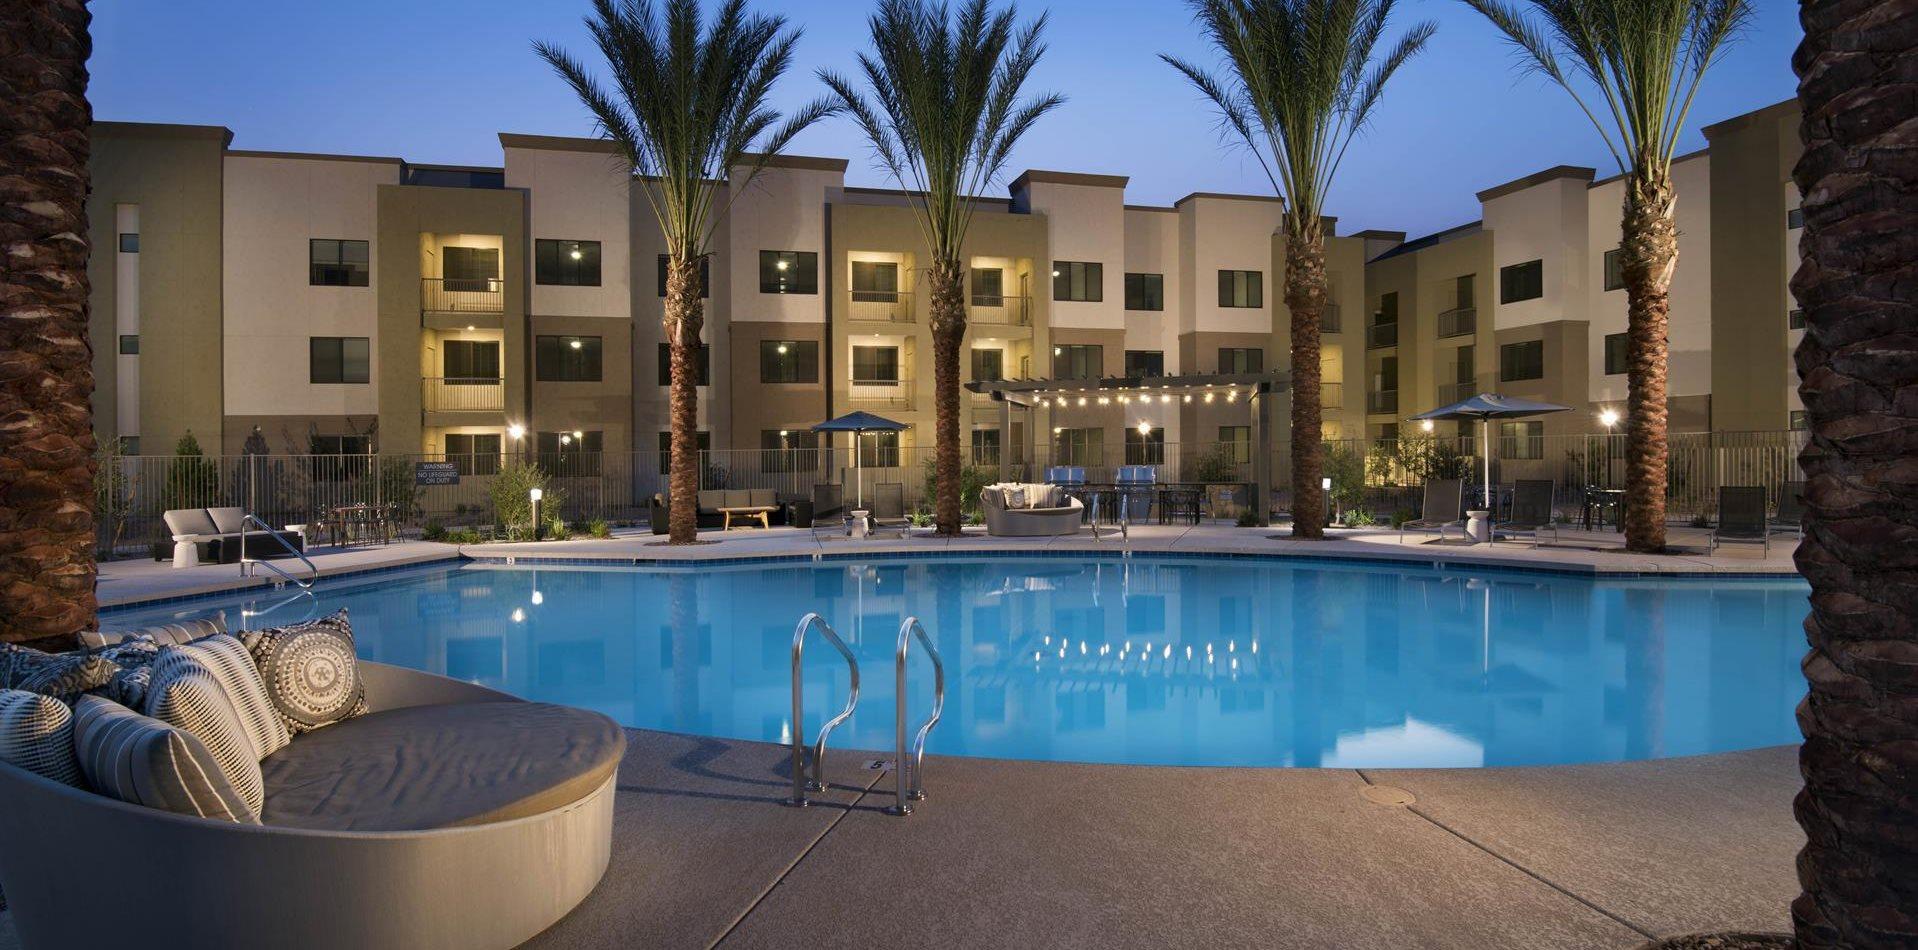 Apartments in north phoenix az trellis apartments - 3 bedroom apartments in randolph ma ...